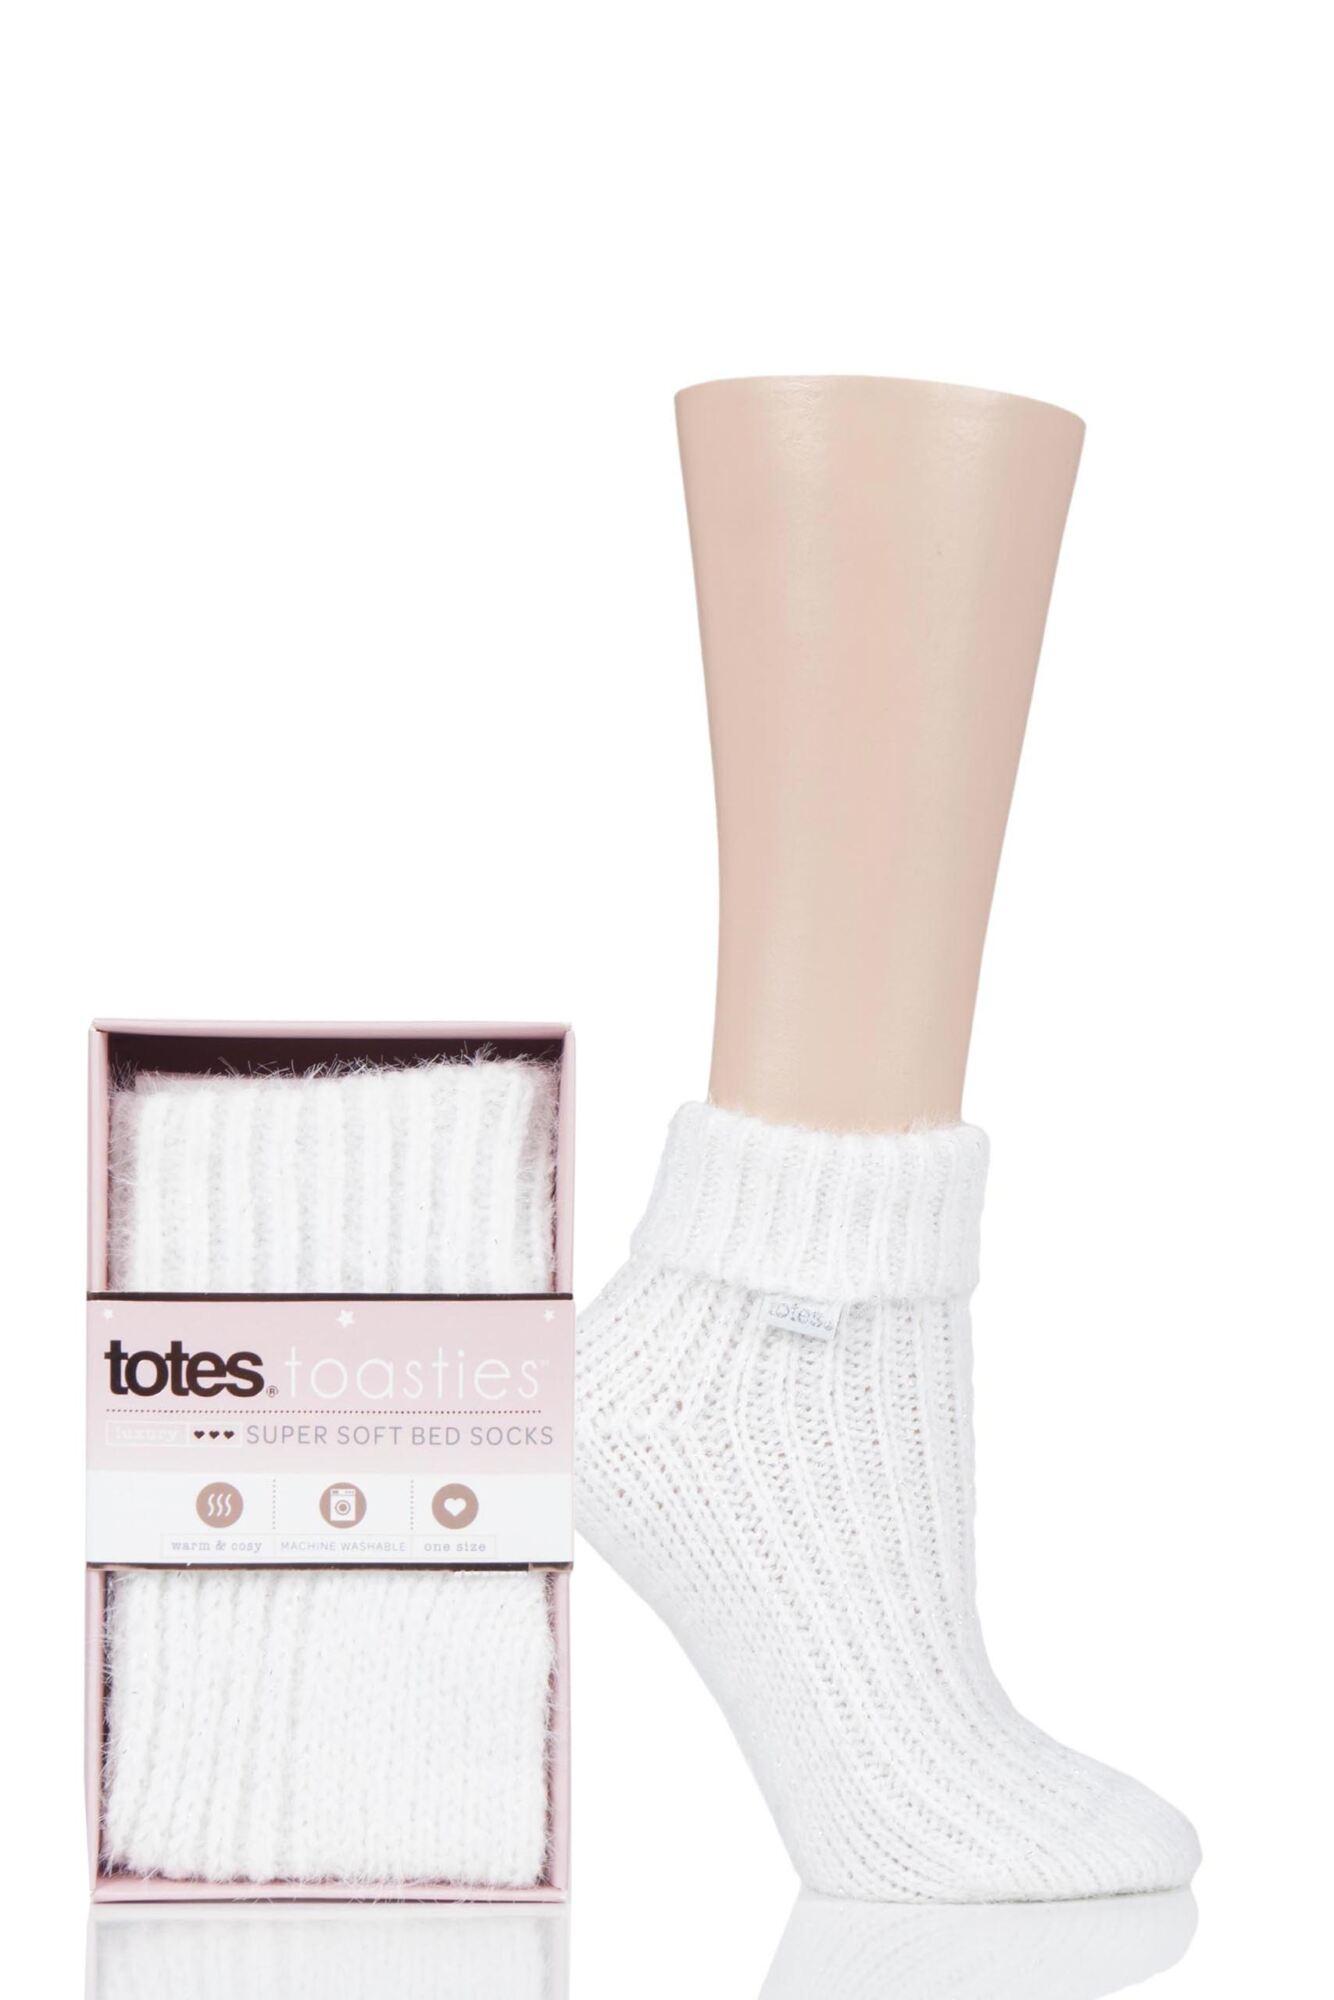 1 Pair Luxurious Super Soft Bed Socks Ladies - Totes